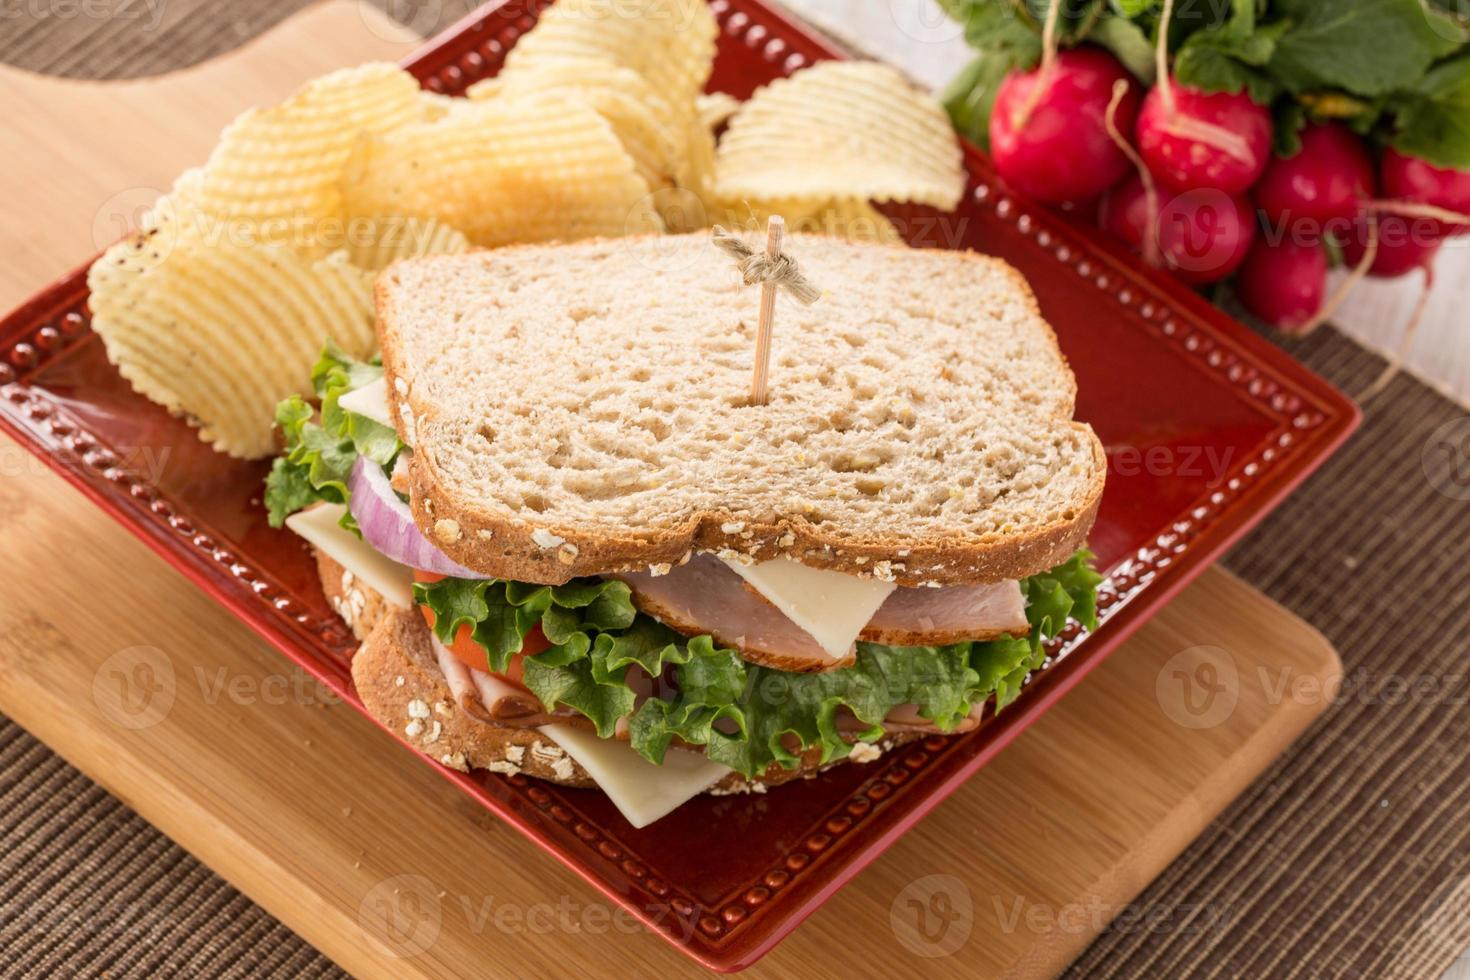 sandwich de jamón y pavo para almorzar con papas fritas foto